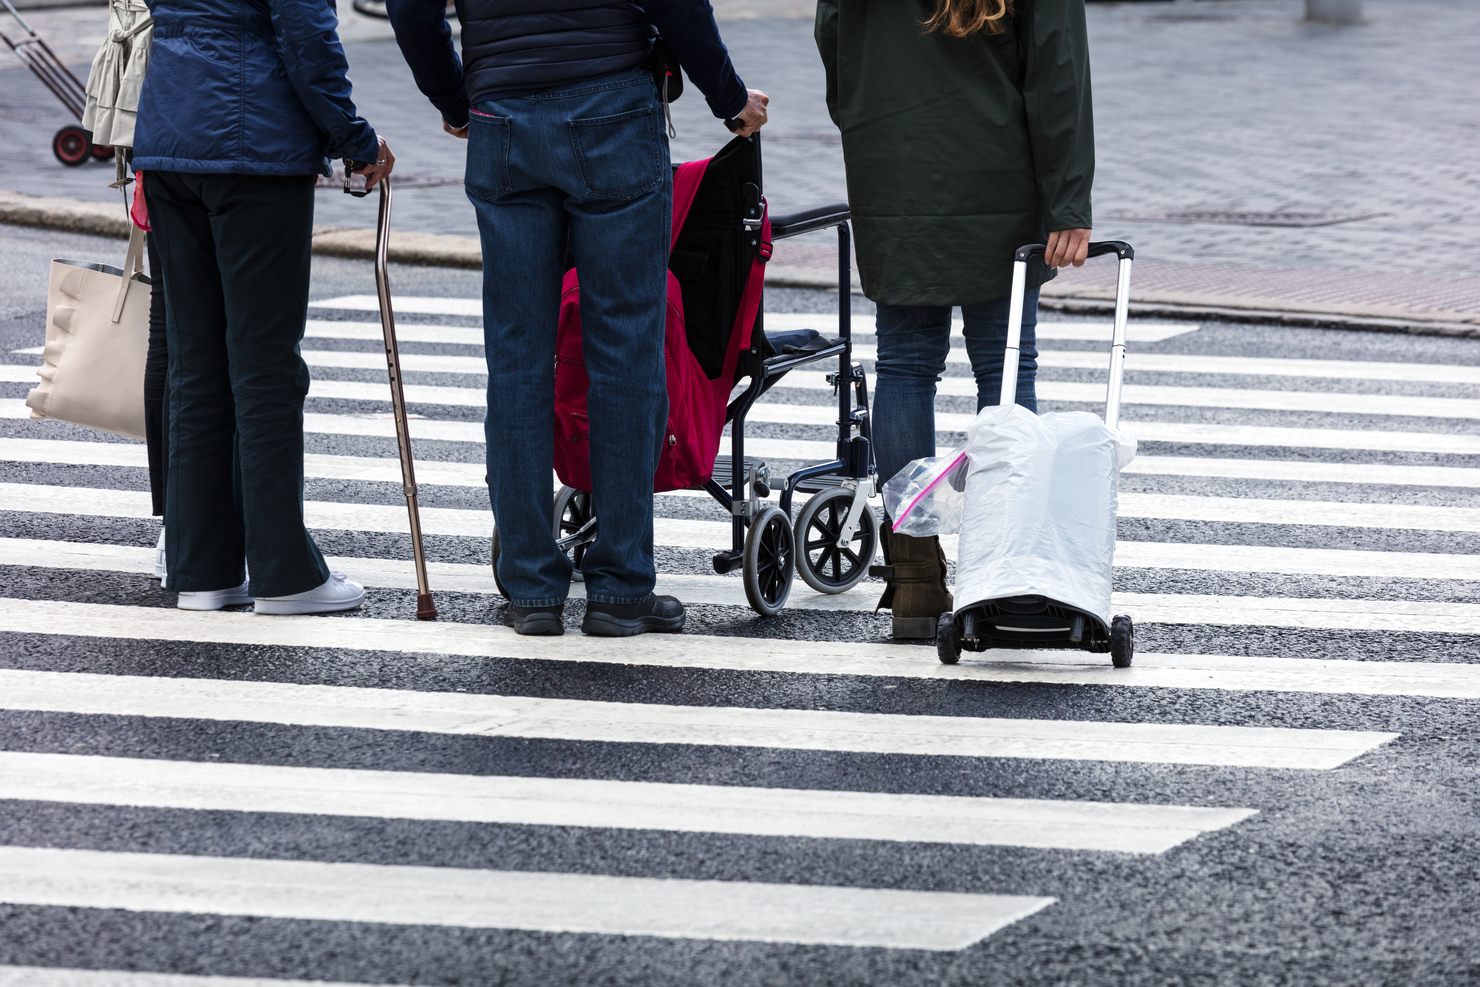 Pedestrians using pedestrian crossing